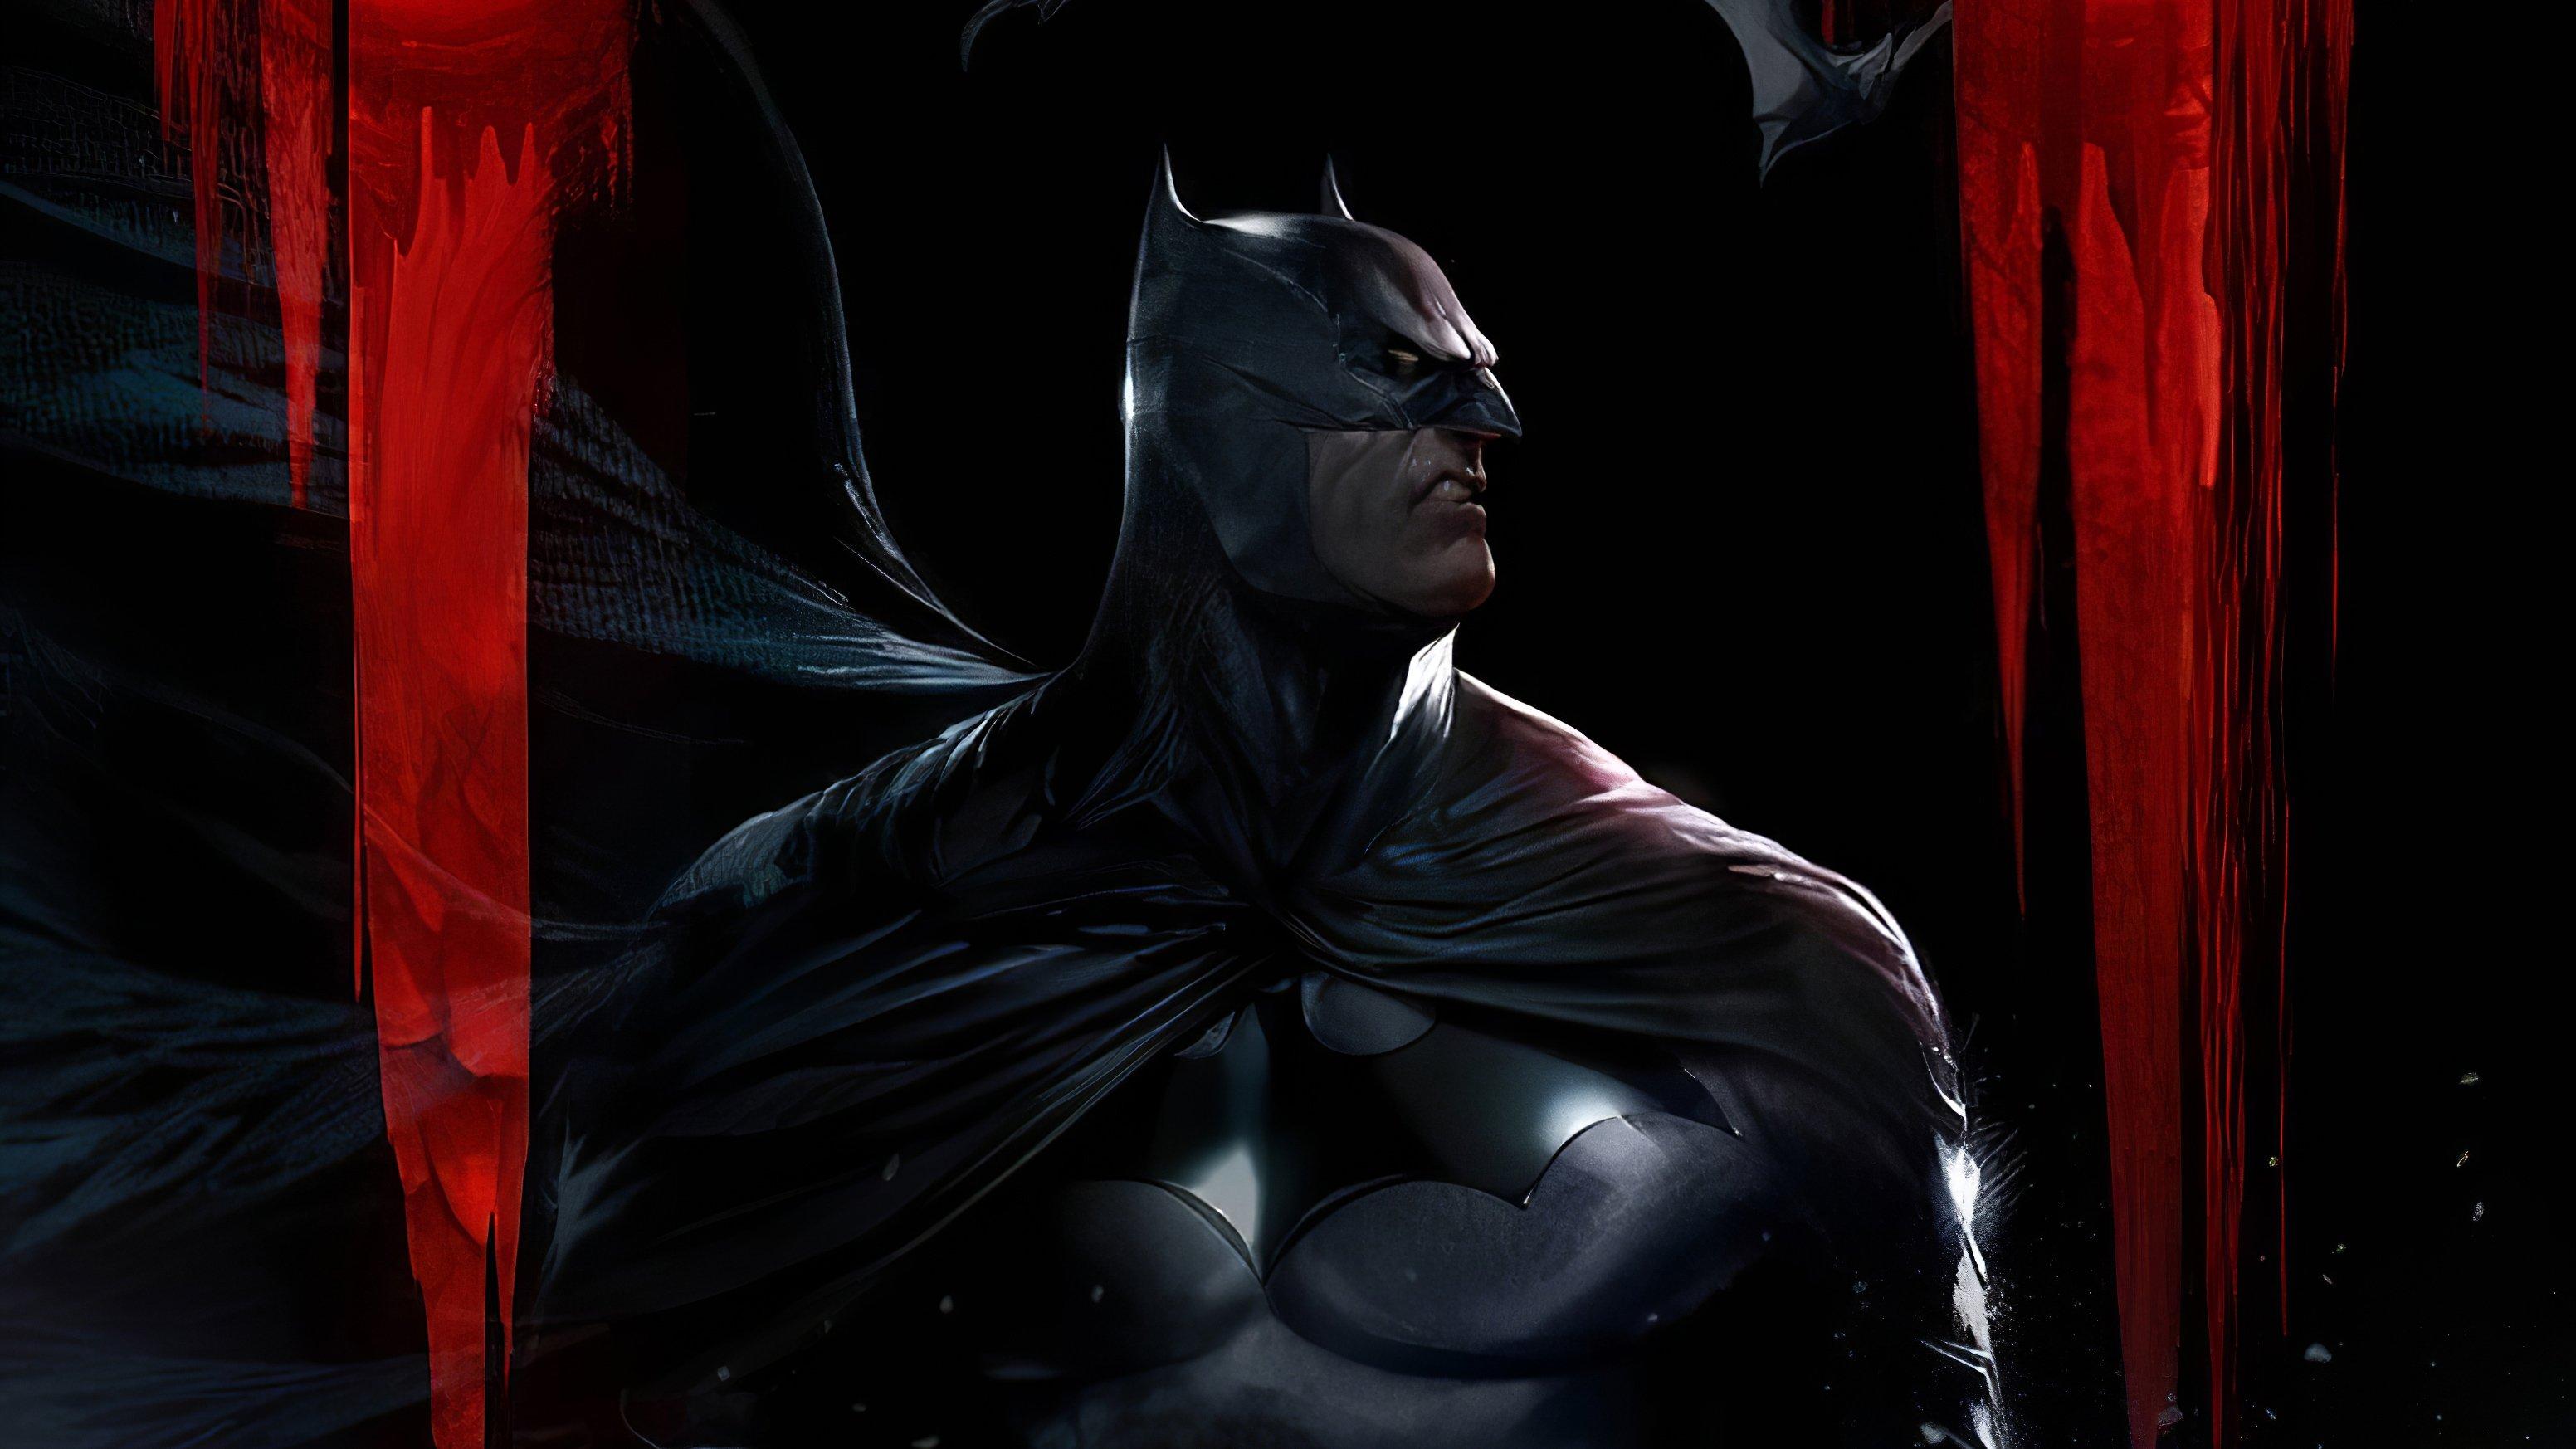 Wallpaper Batman in the dark